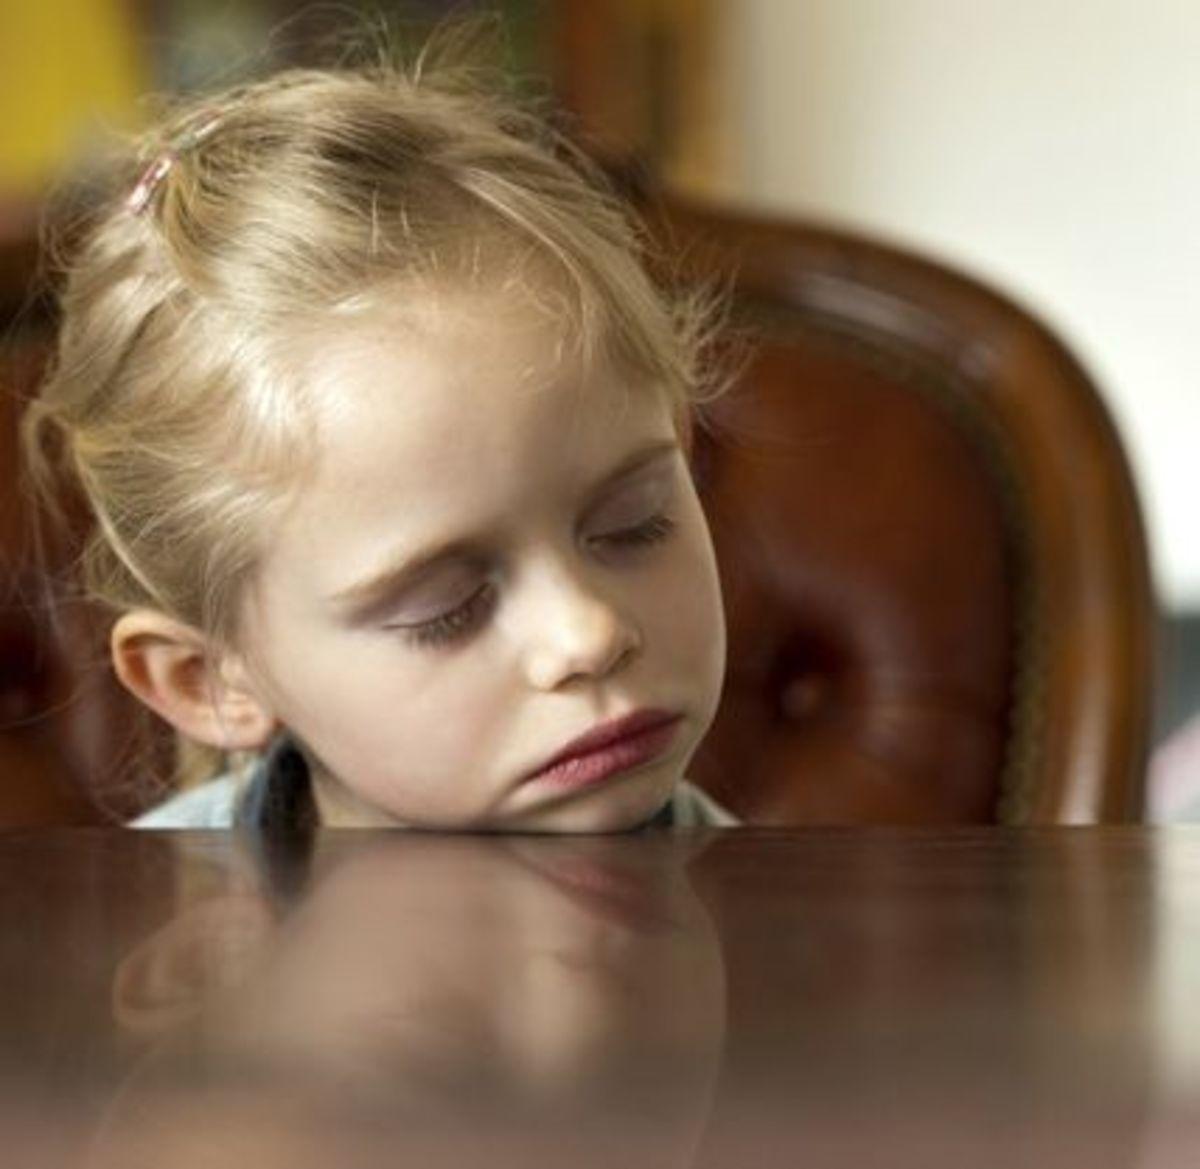 TBI : Fatigue After Brain Injury